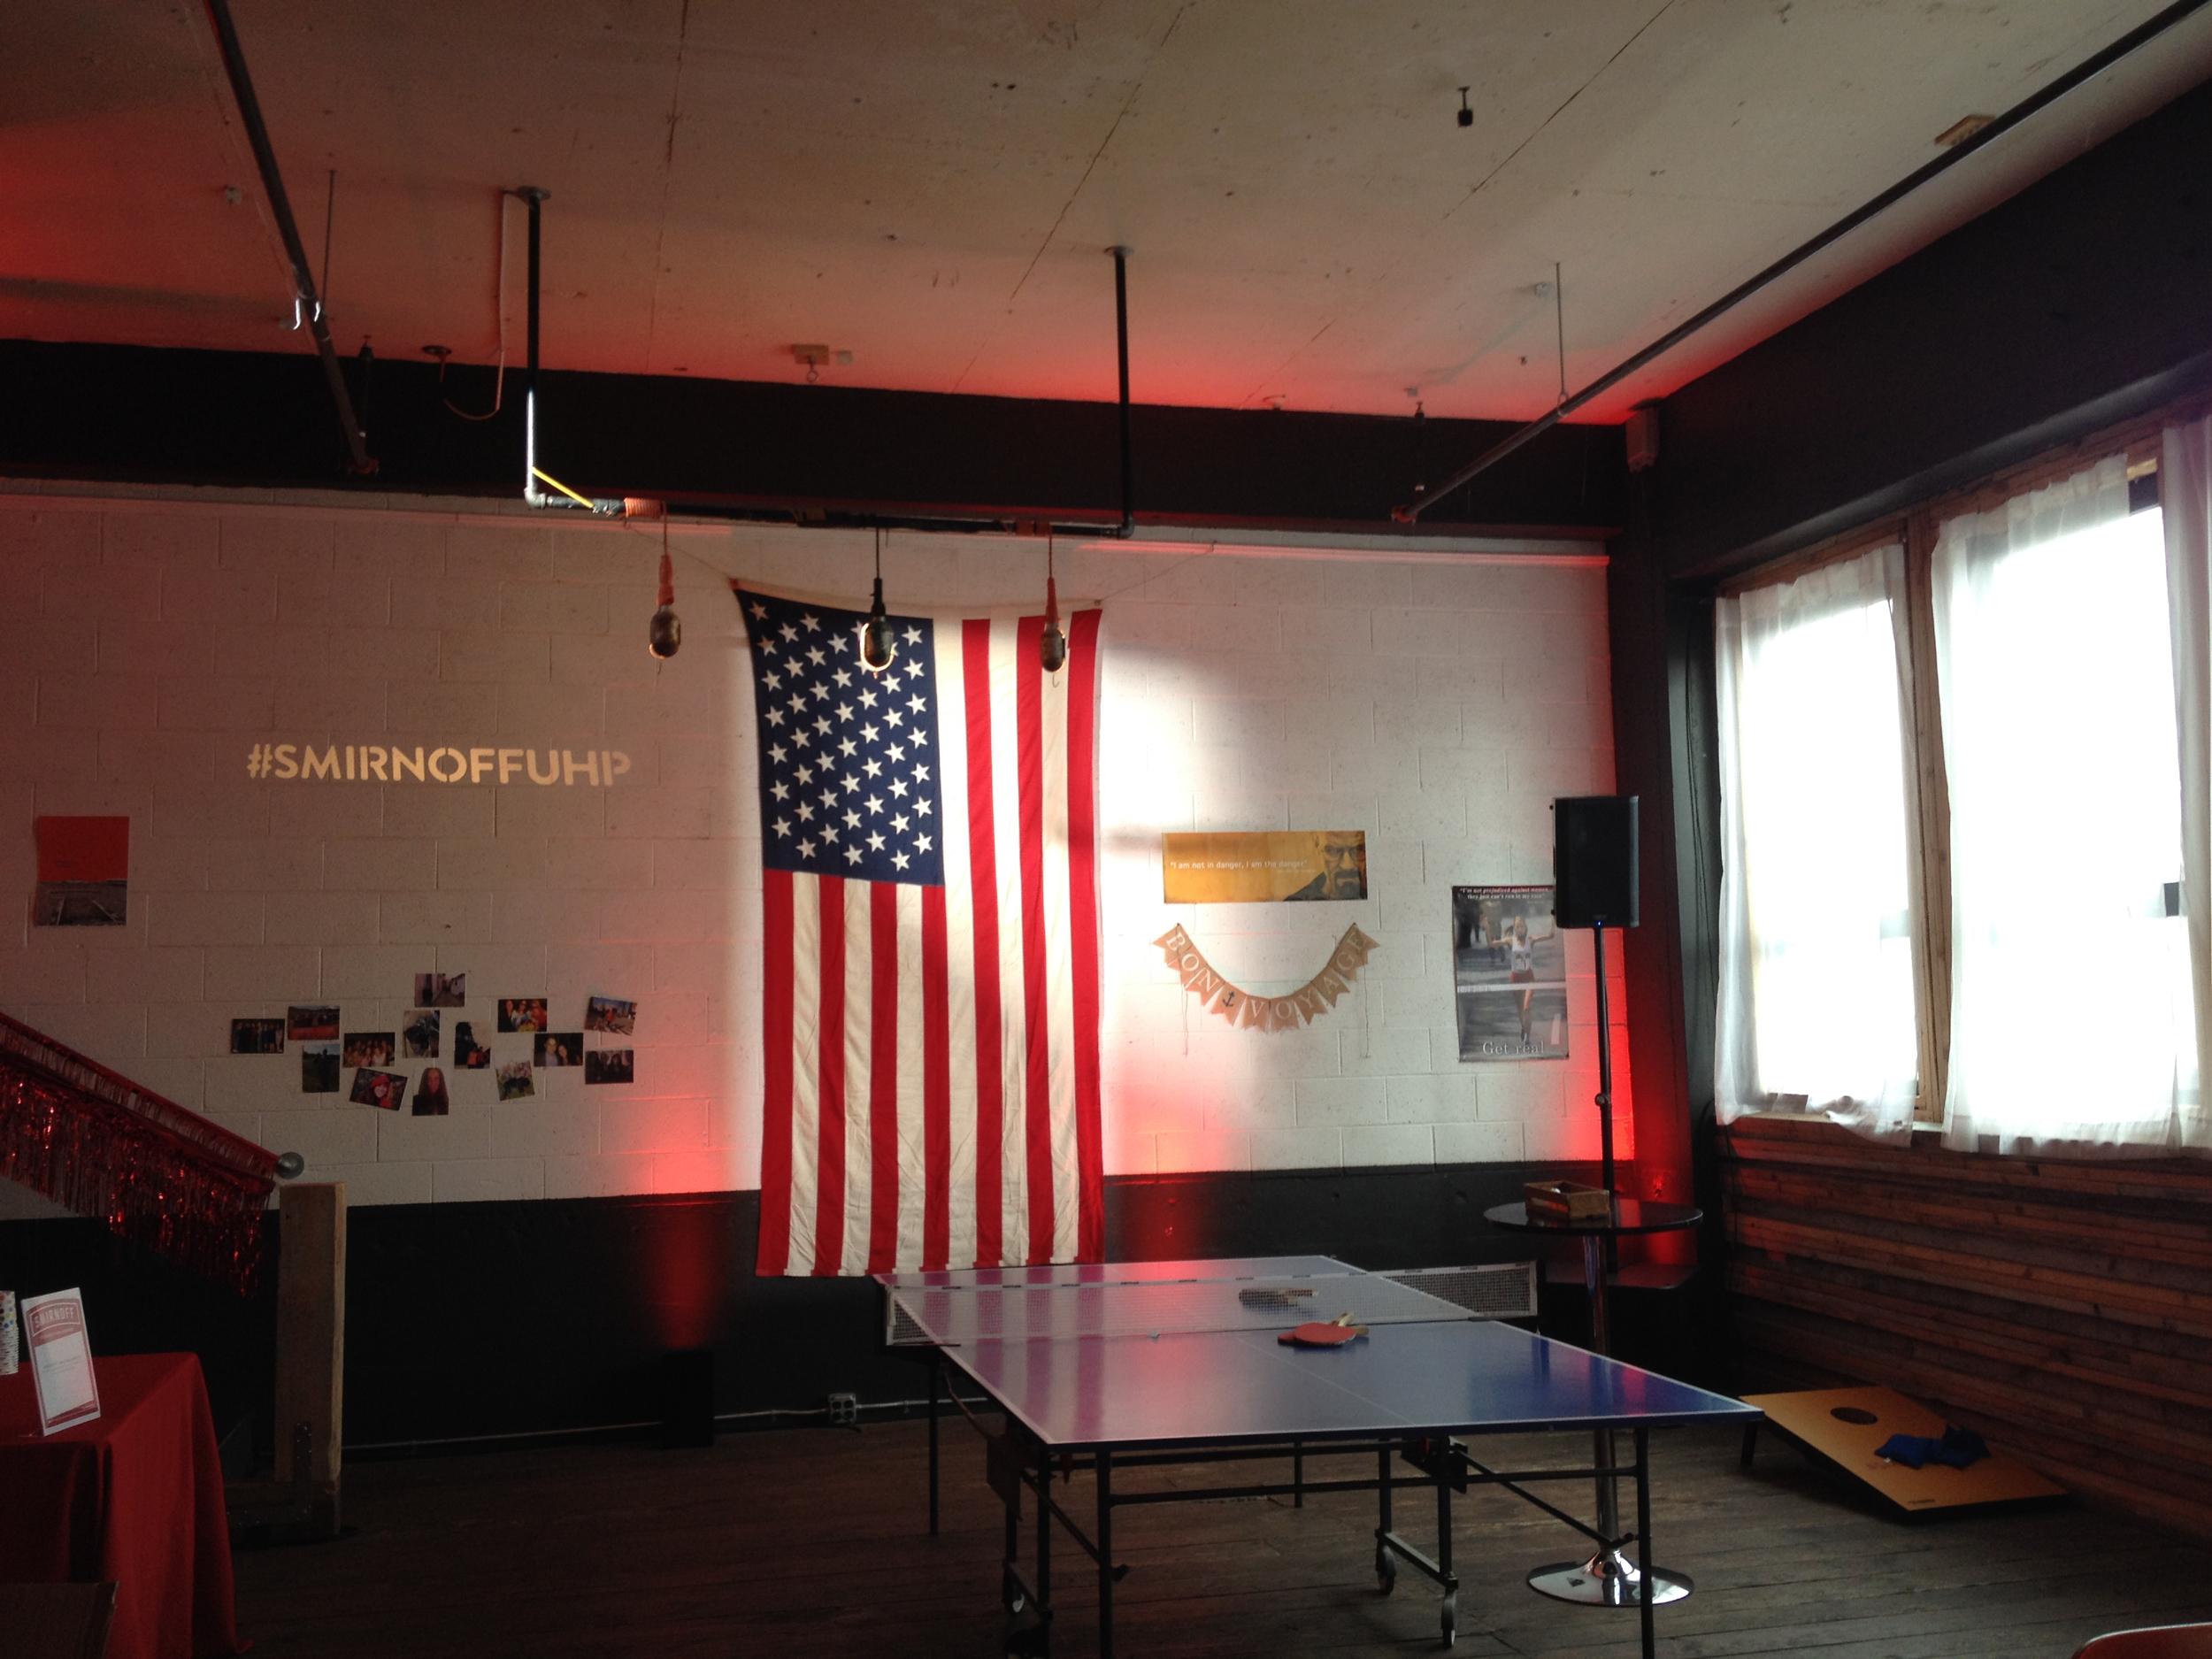 Smirnoff Airbnb event